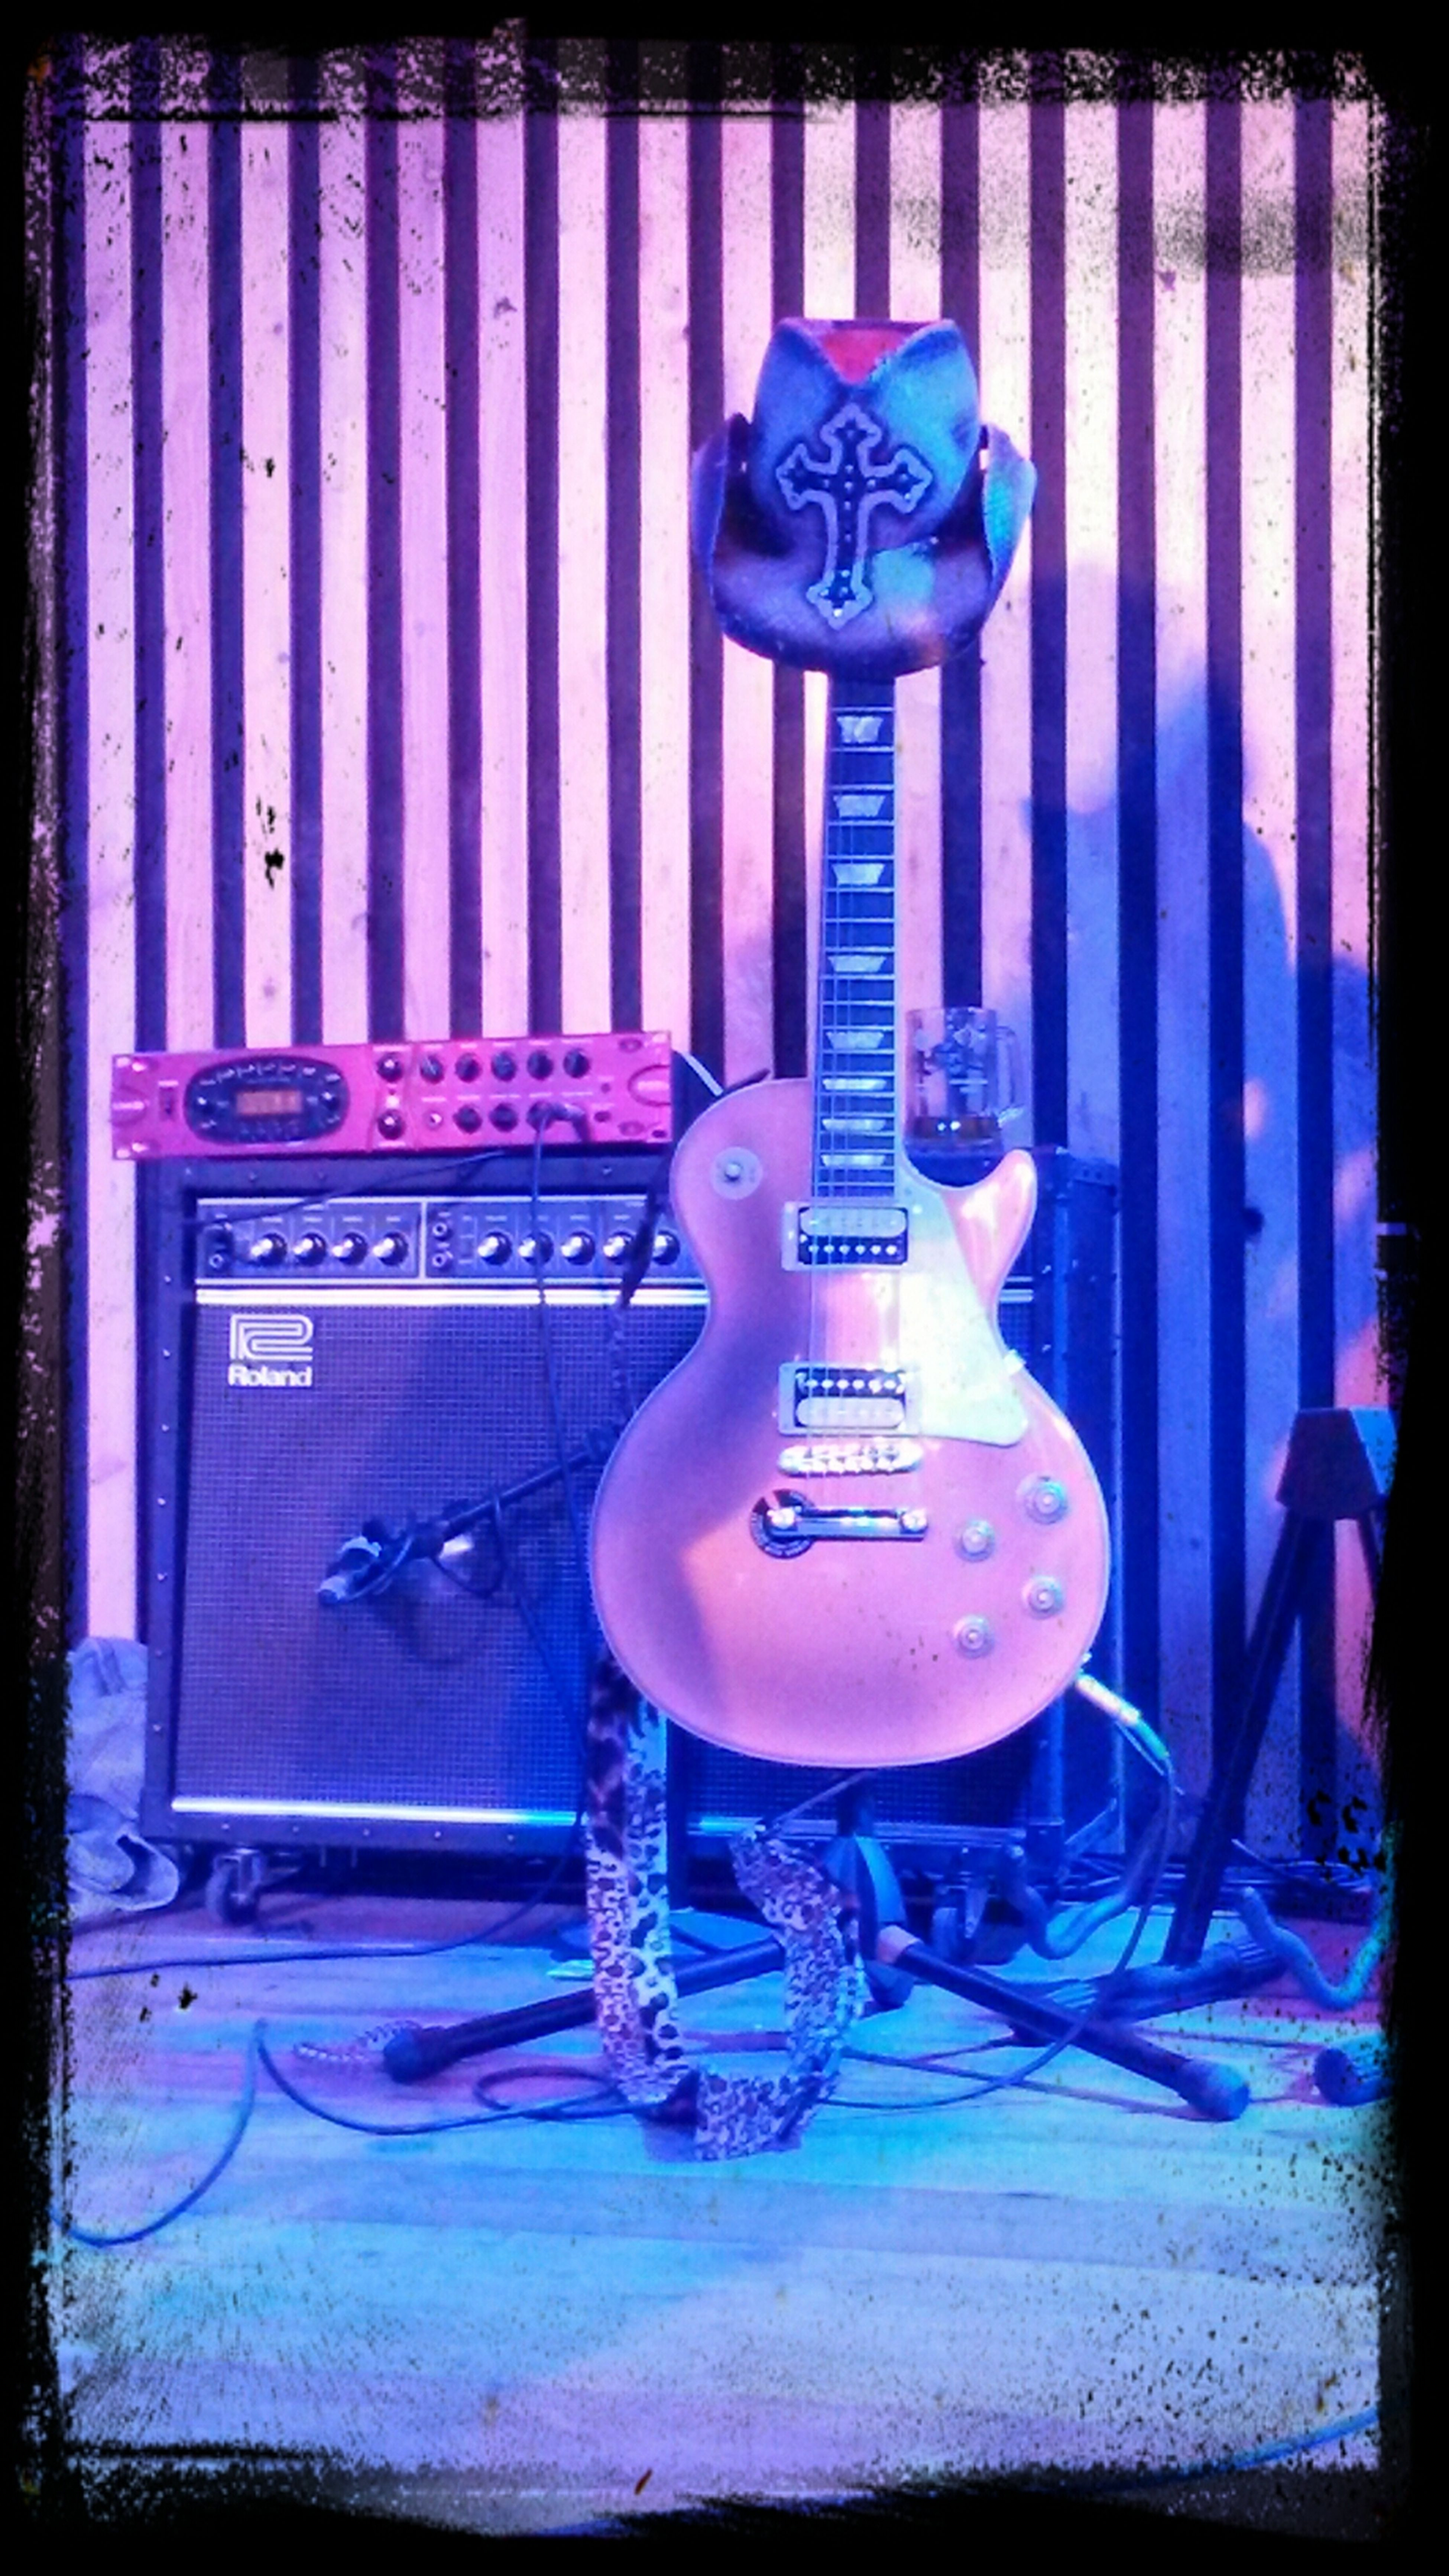 My Guitar. Les Paul. Selfie. ;D